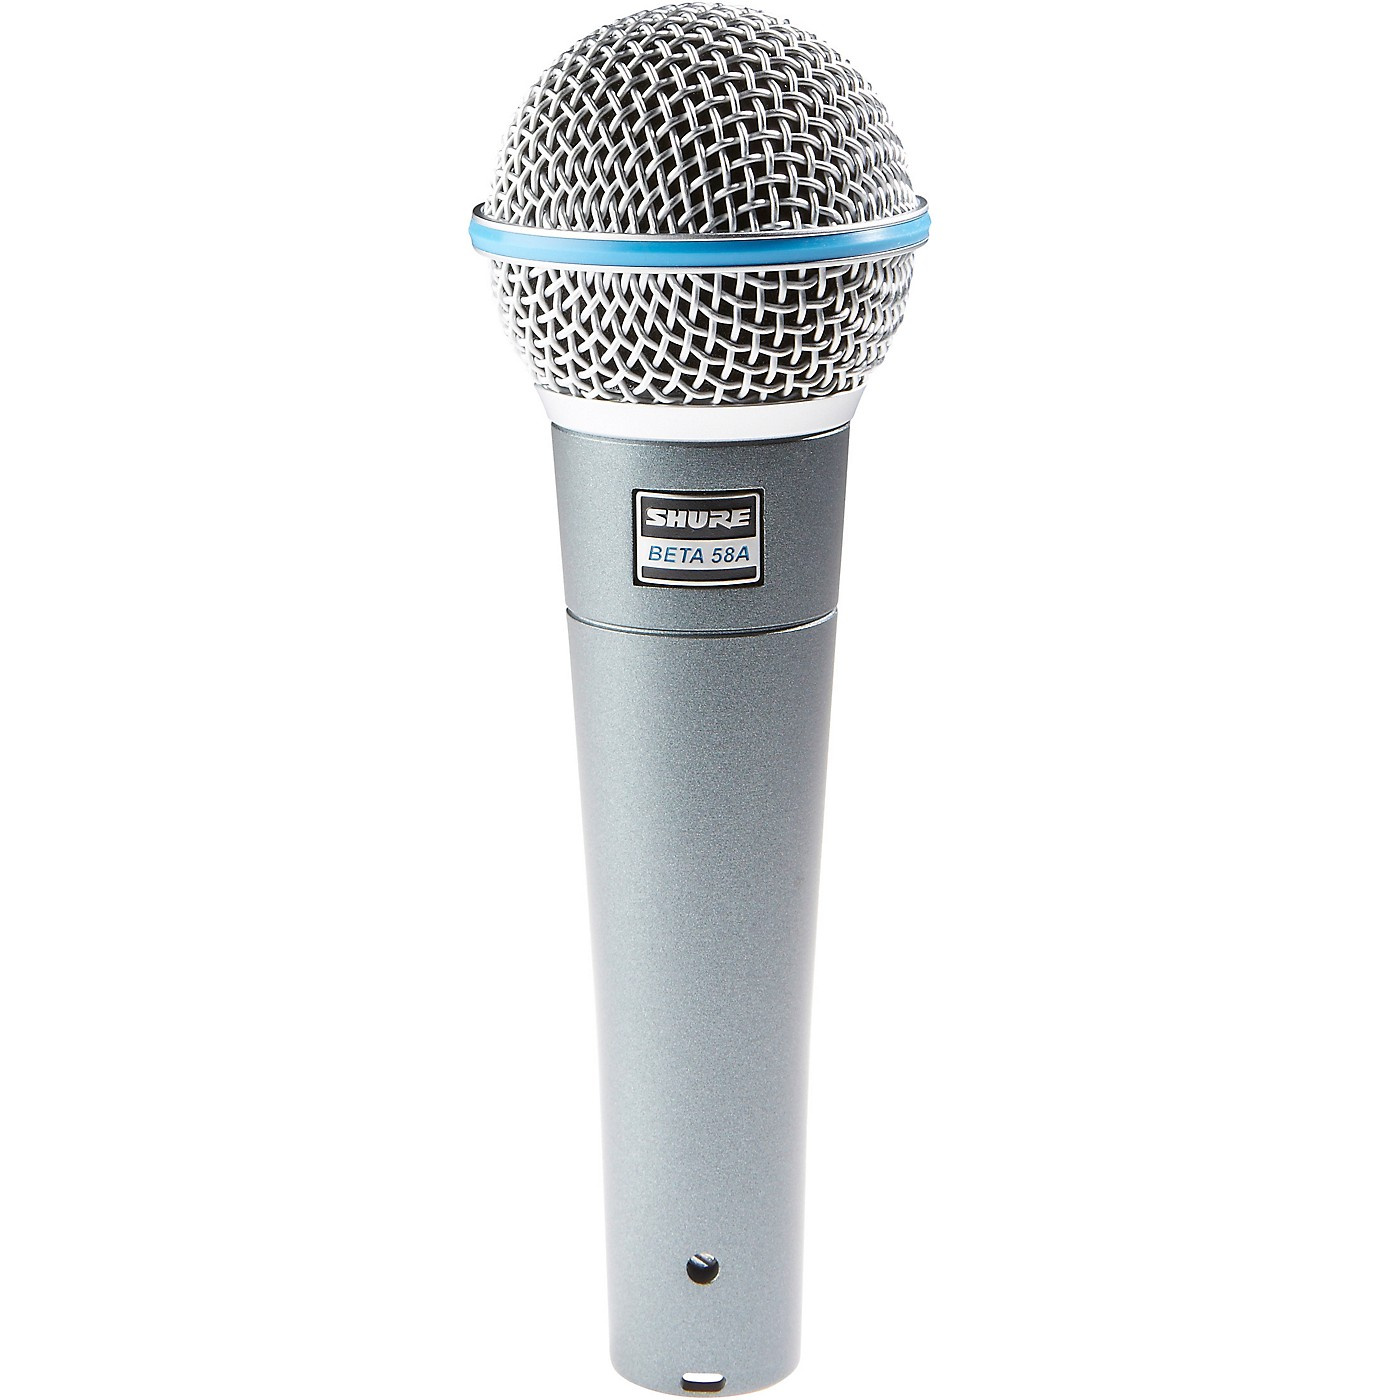 Shure BETA 58A Supercardioid Dynamic Vocal Microphone thumbnail